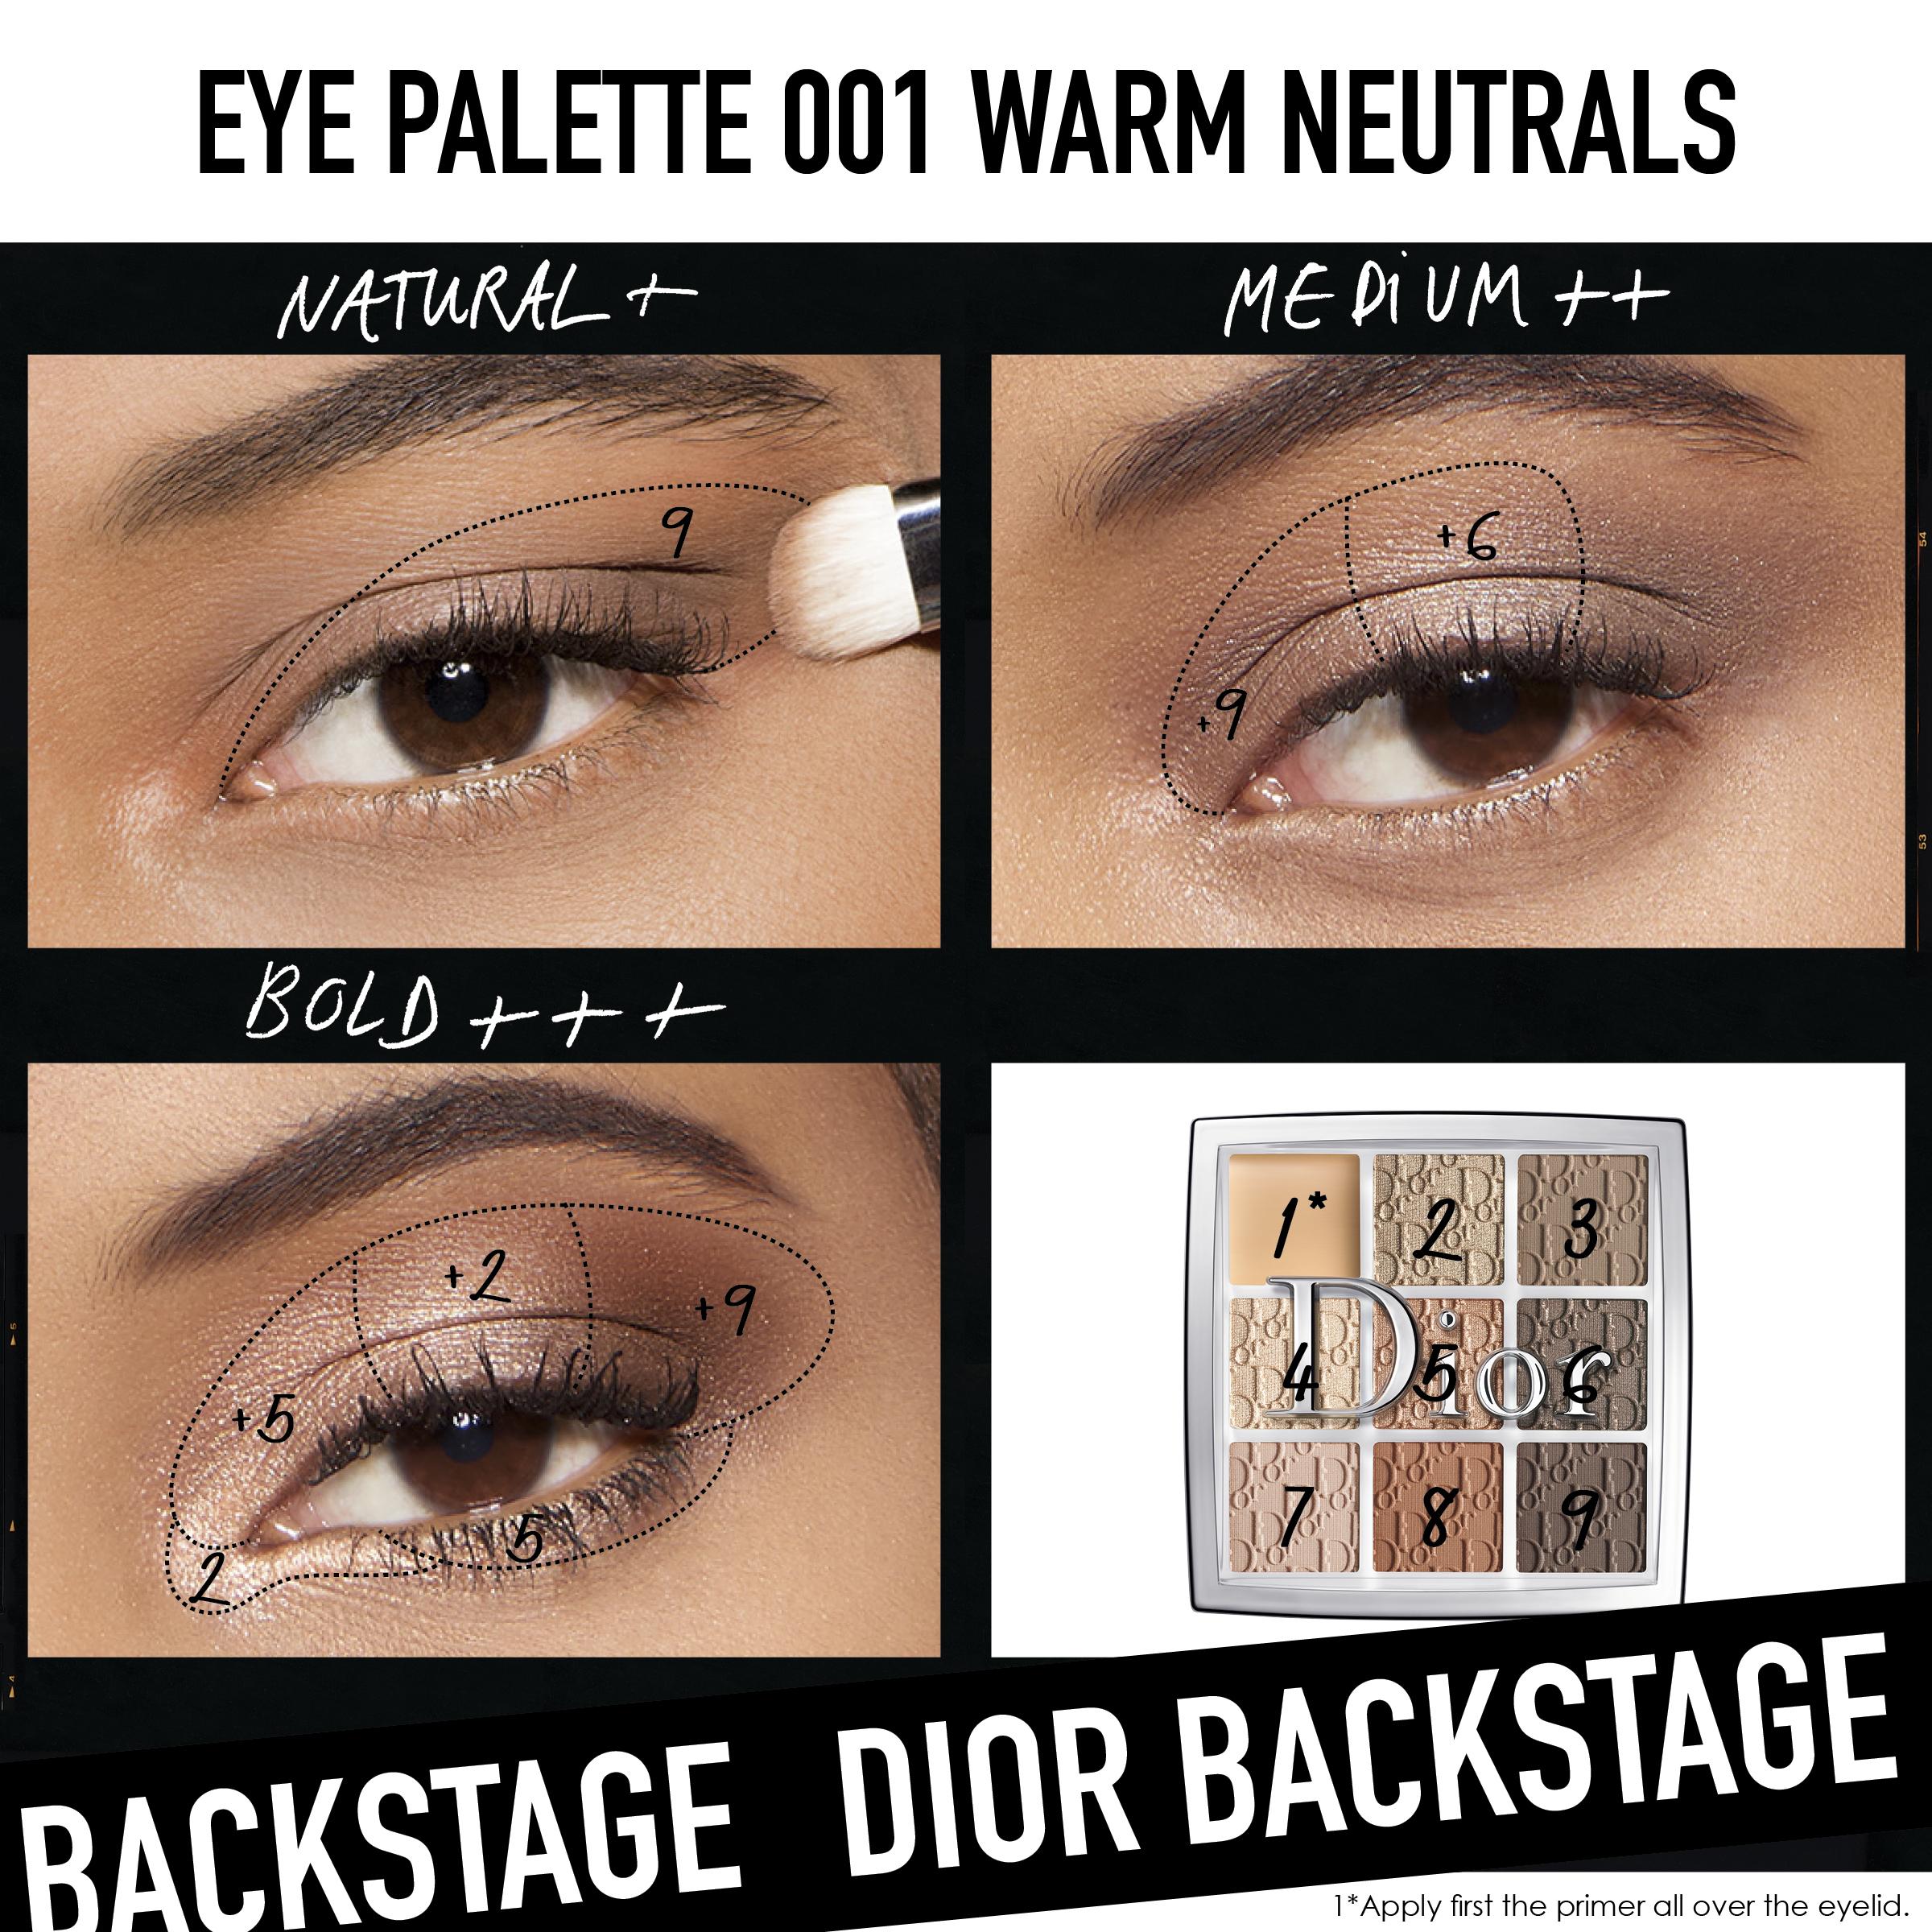 Backstage Eye Palette 001Warm